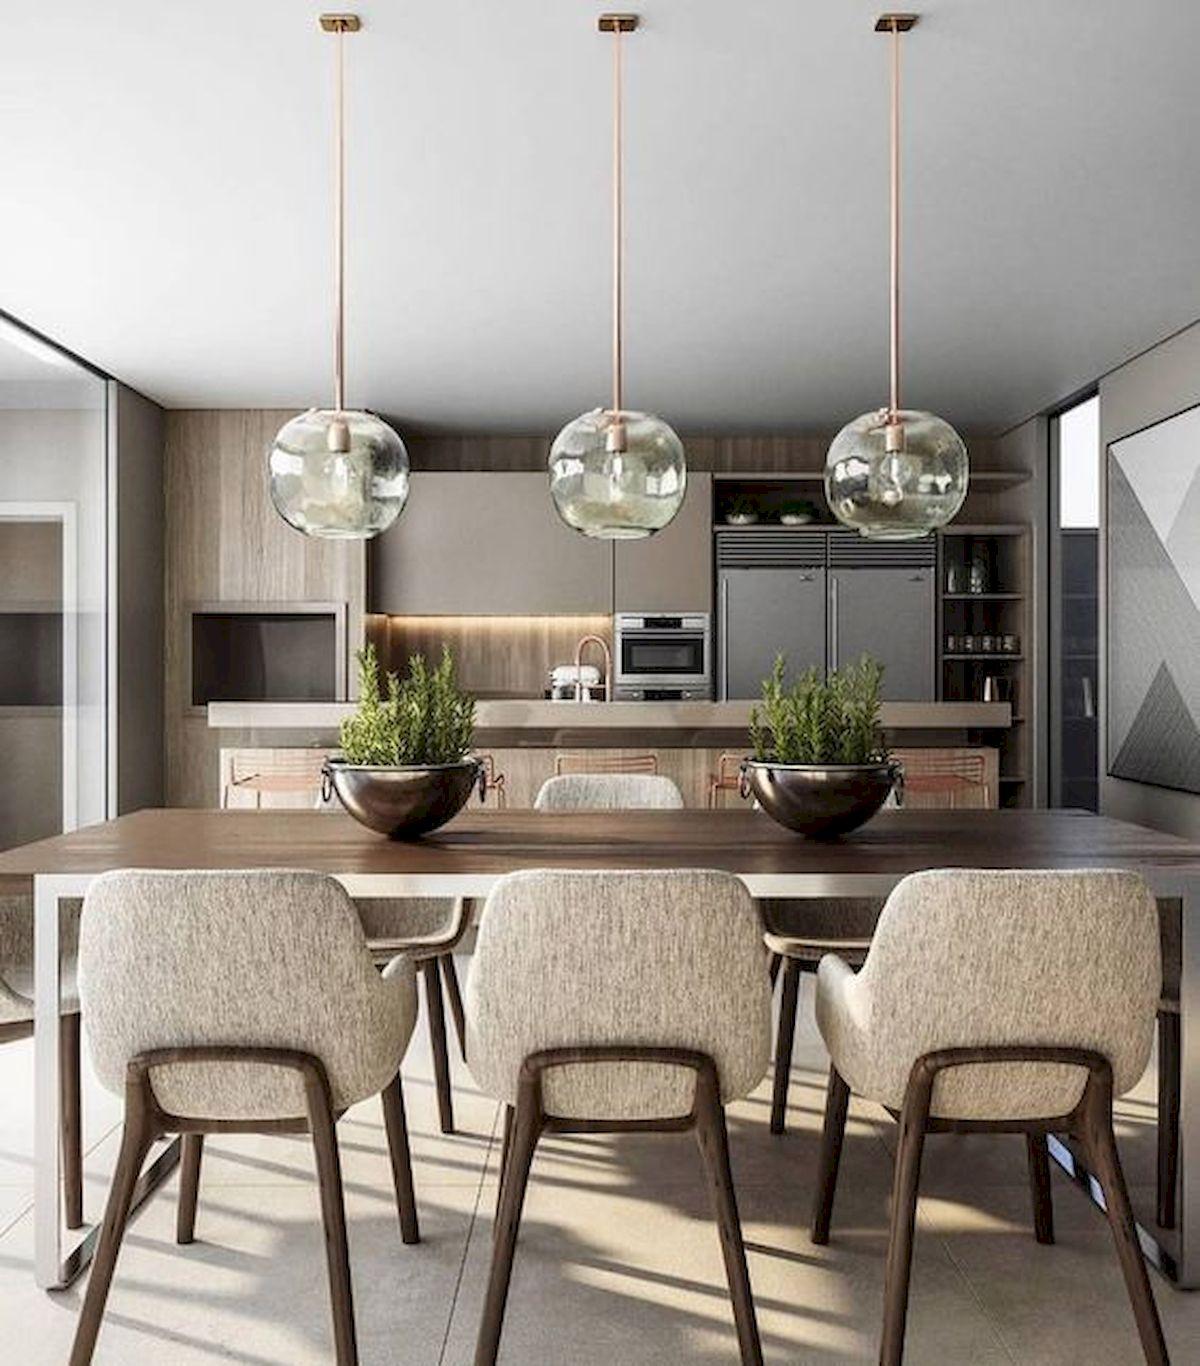 80 Elegant Modern Dining Room Design And Decor Ideas (56)